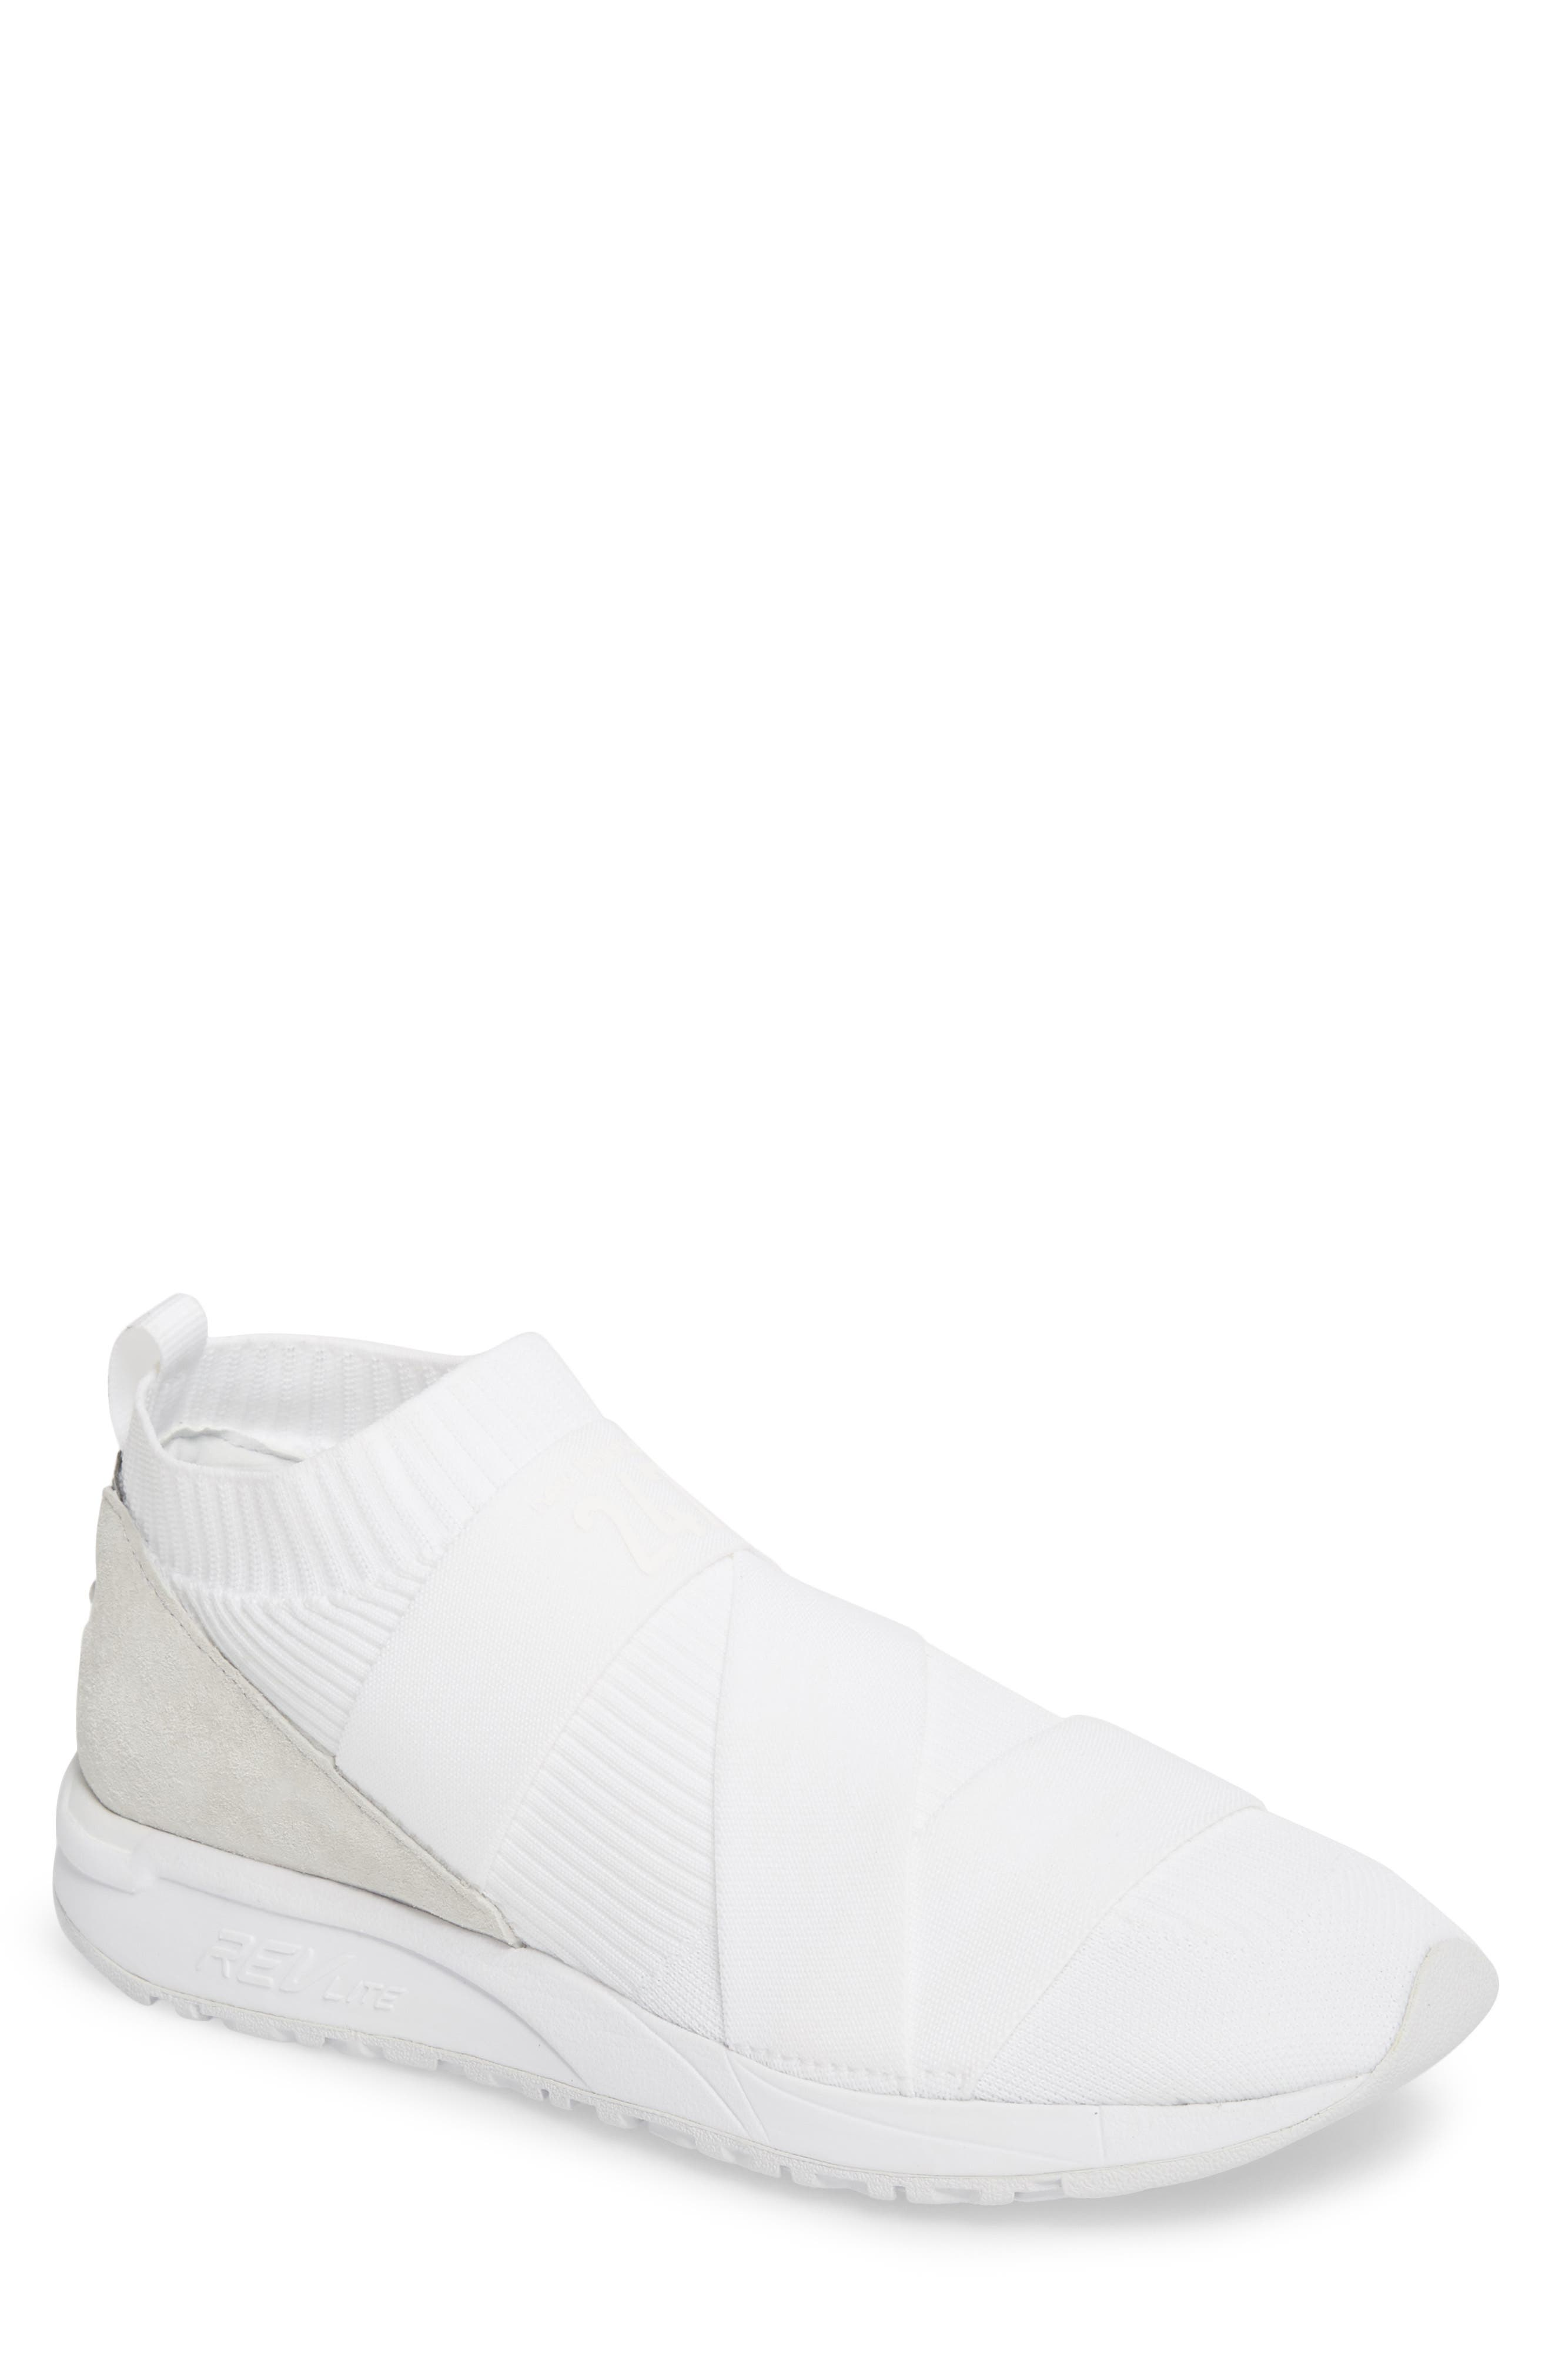 New Balance 247 Knit Sneaker (Men)